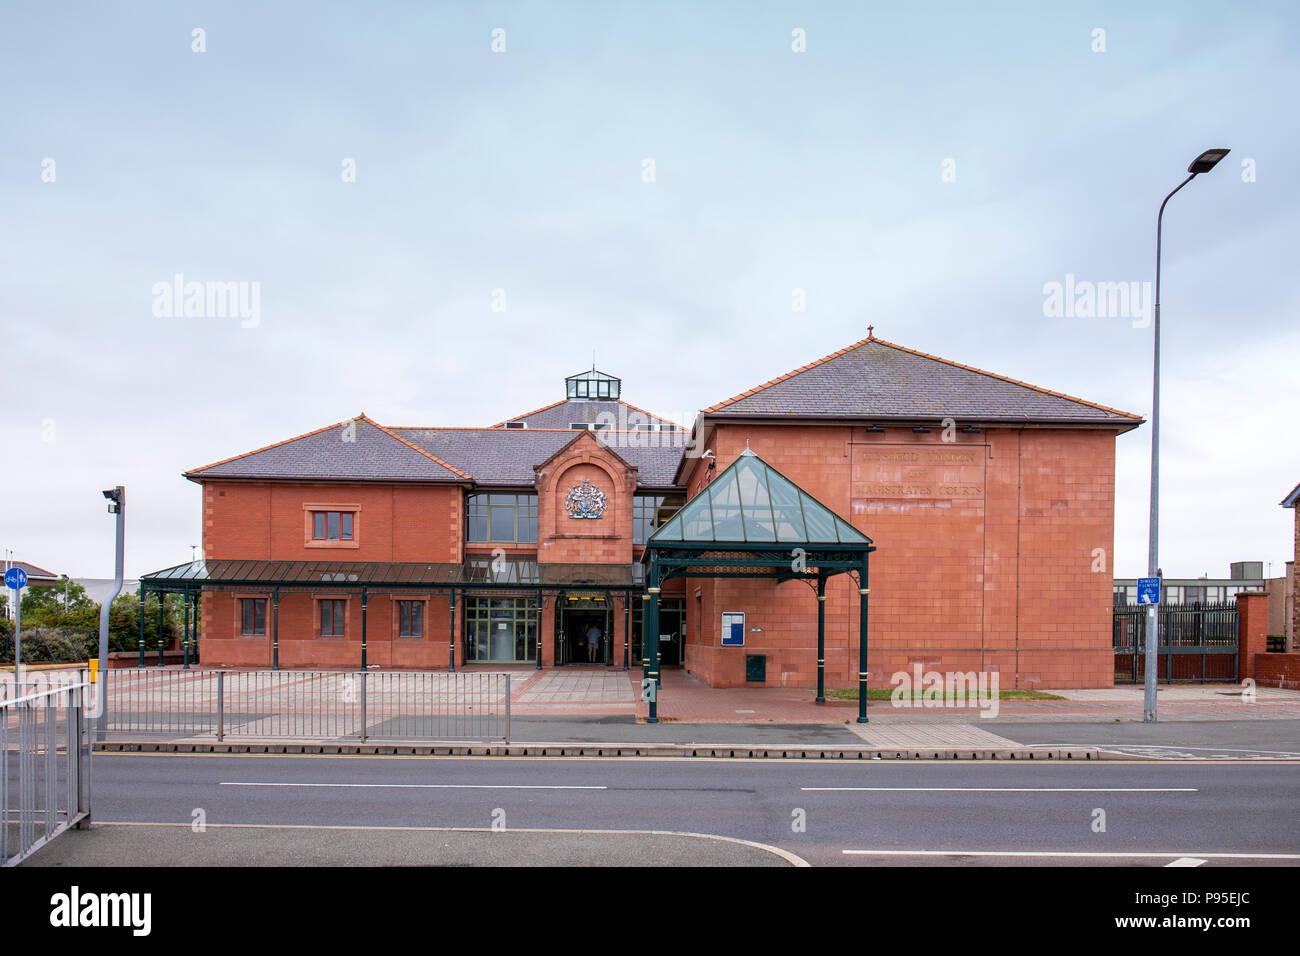 Magistrates Courts in Llandudno Wales UK - Stock Image